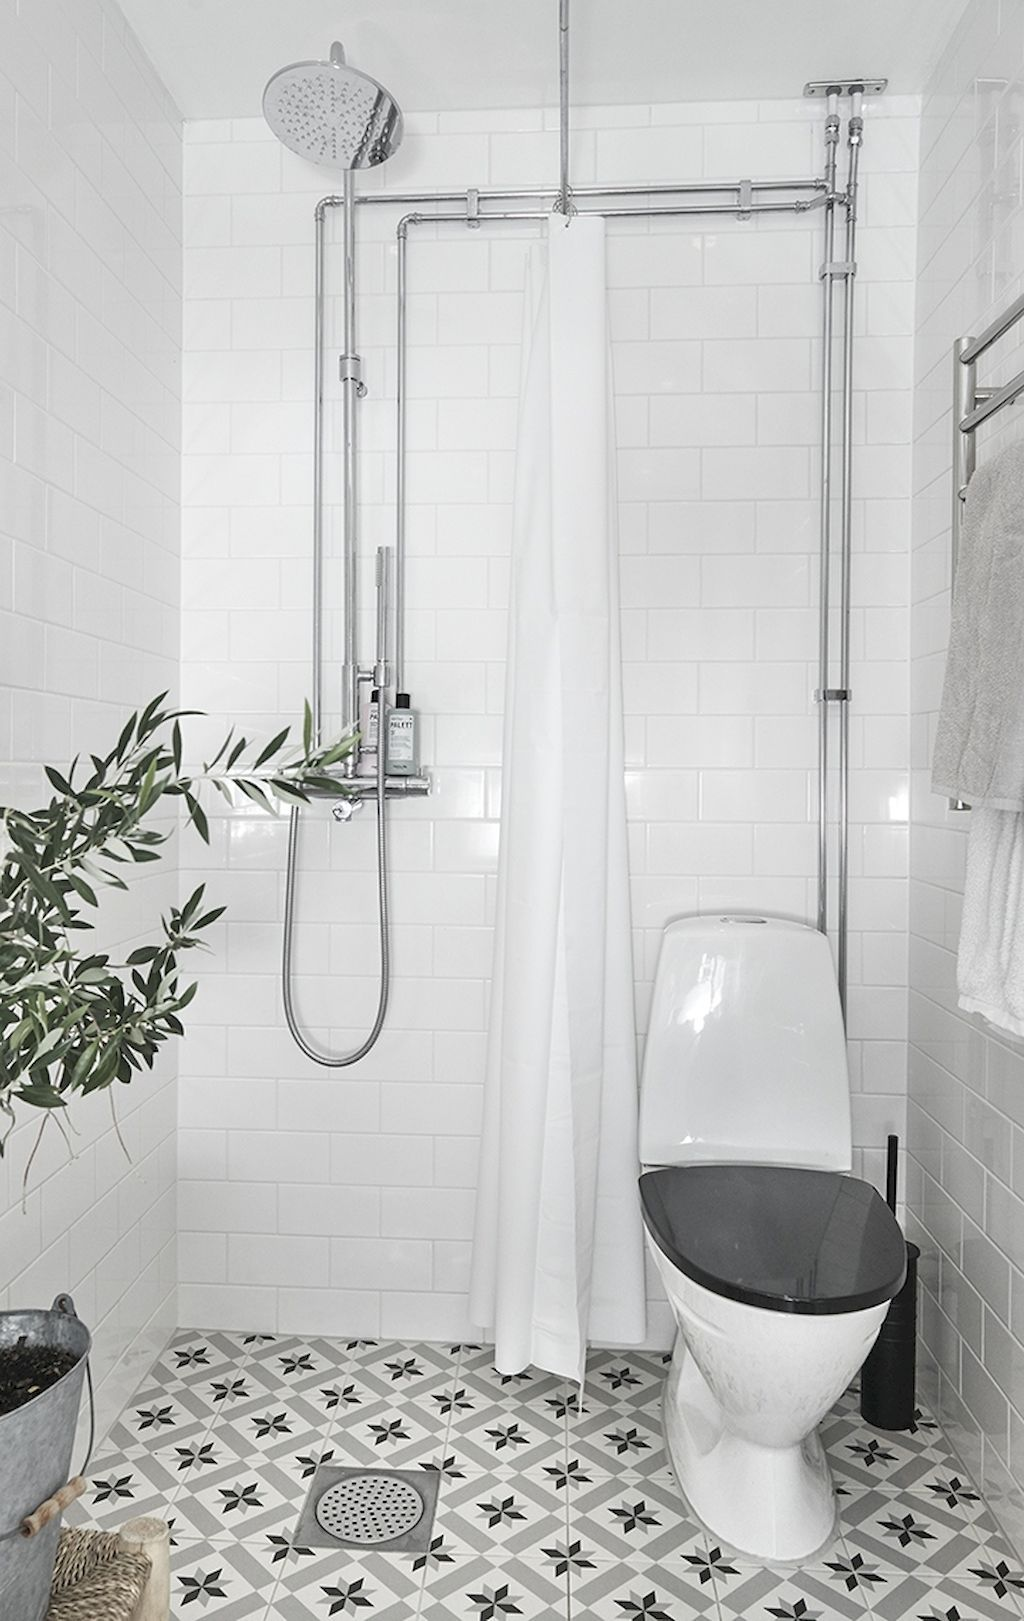 Wet Room Design: Awesome 77 Elegant Scandinavian Interior Design Decor